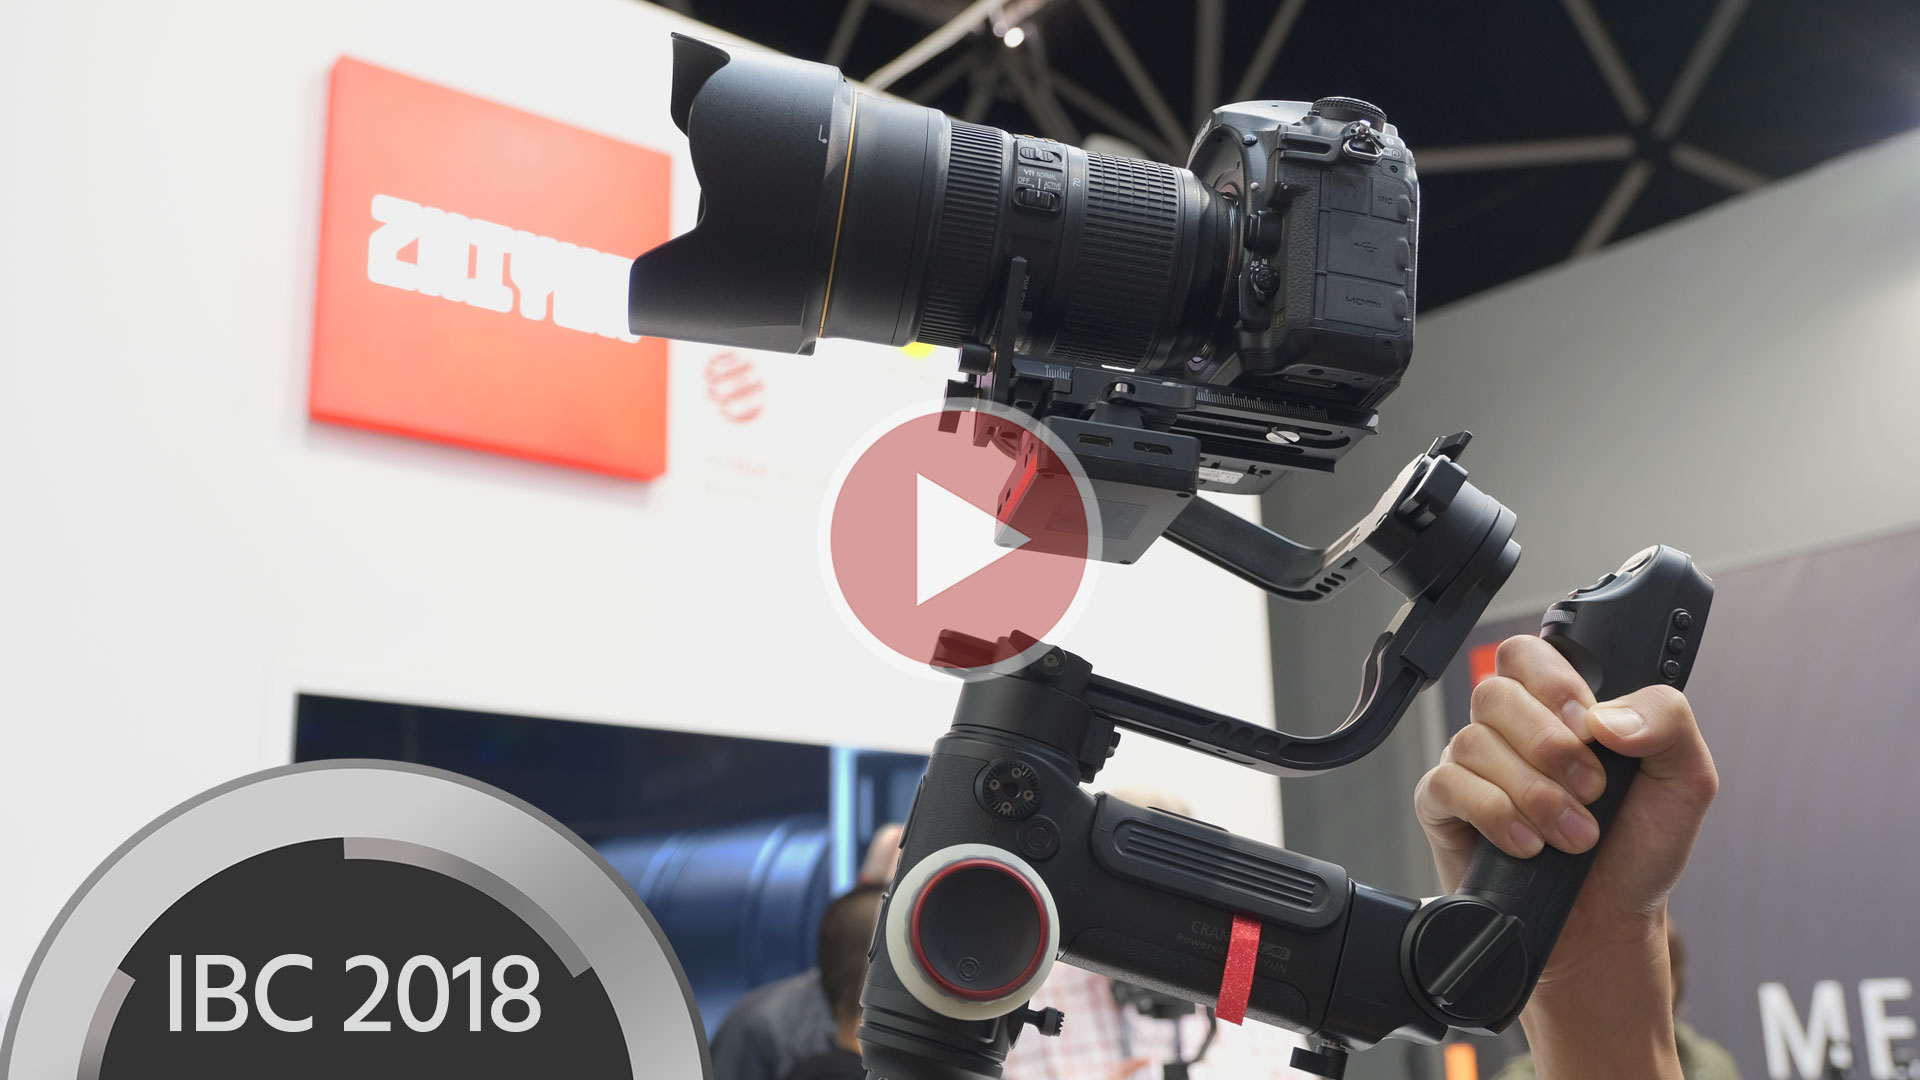 Zhiyun-TechがCrane 3 LABとWeebil LABハンドヘルドジンバルを発表